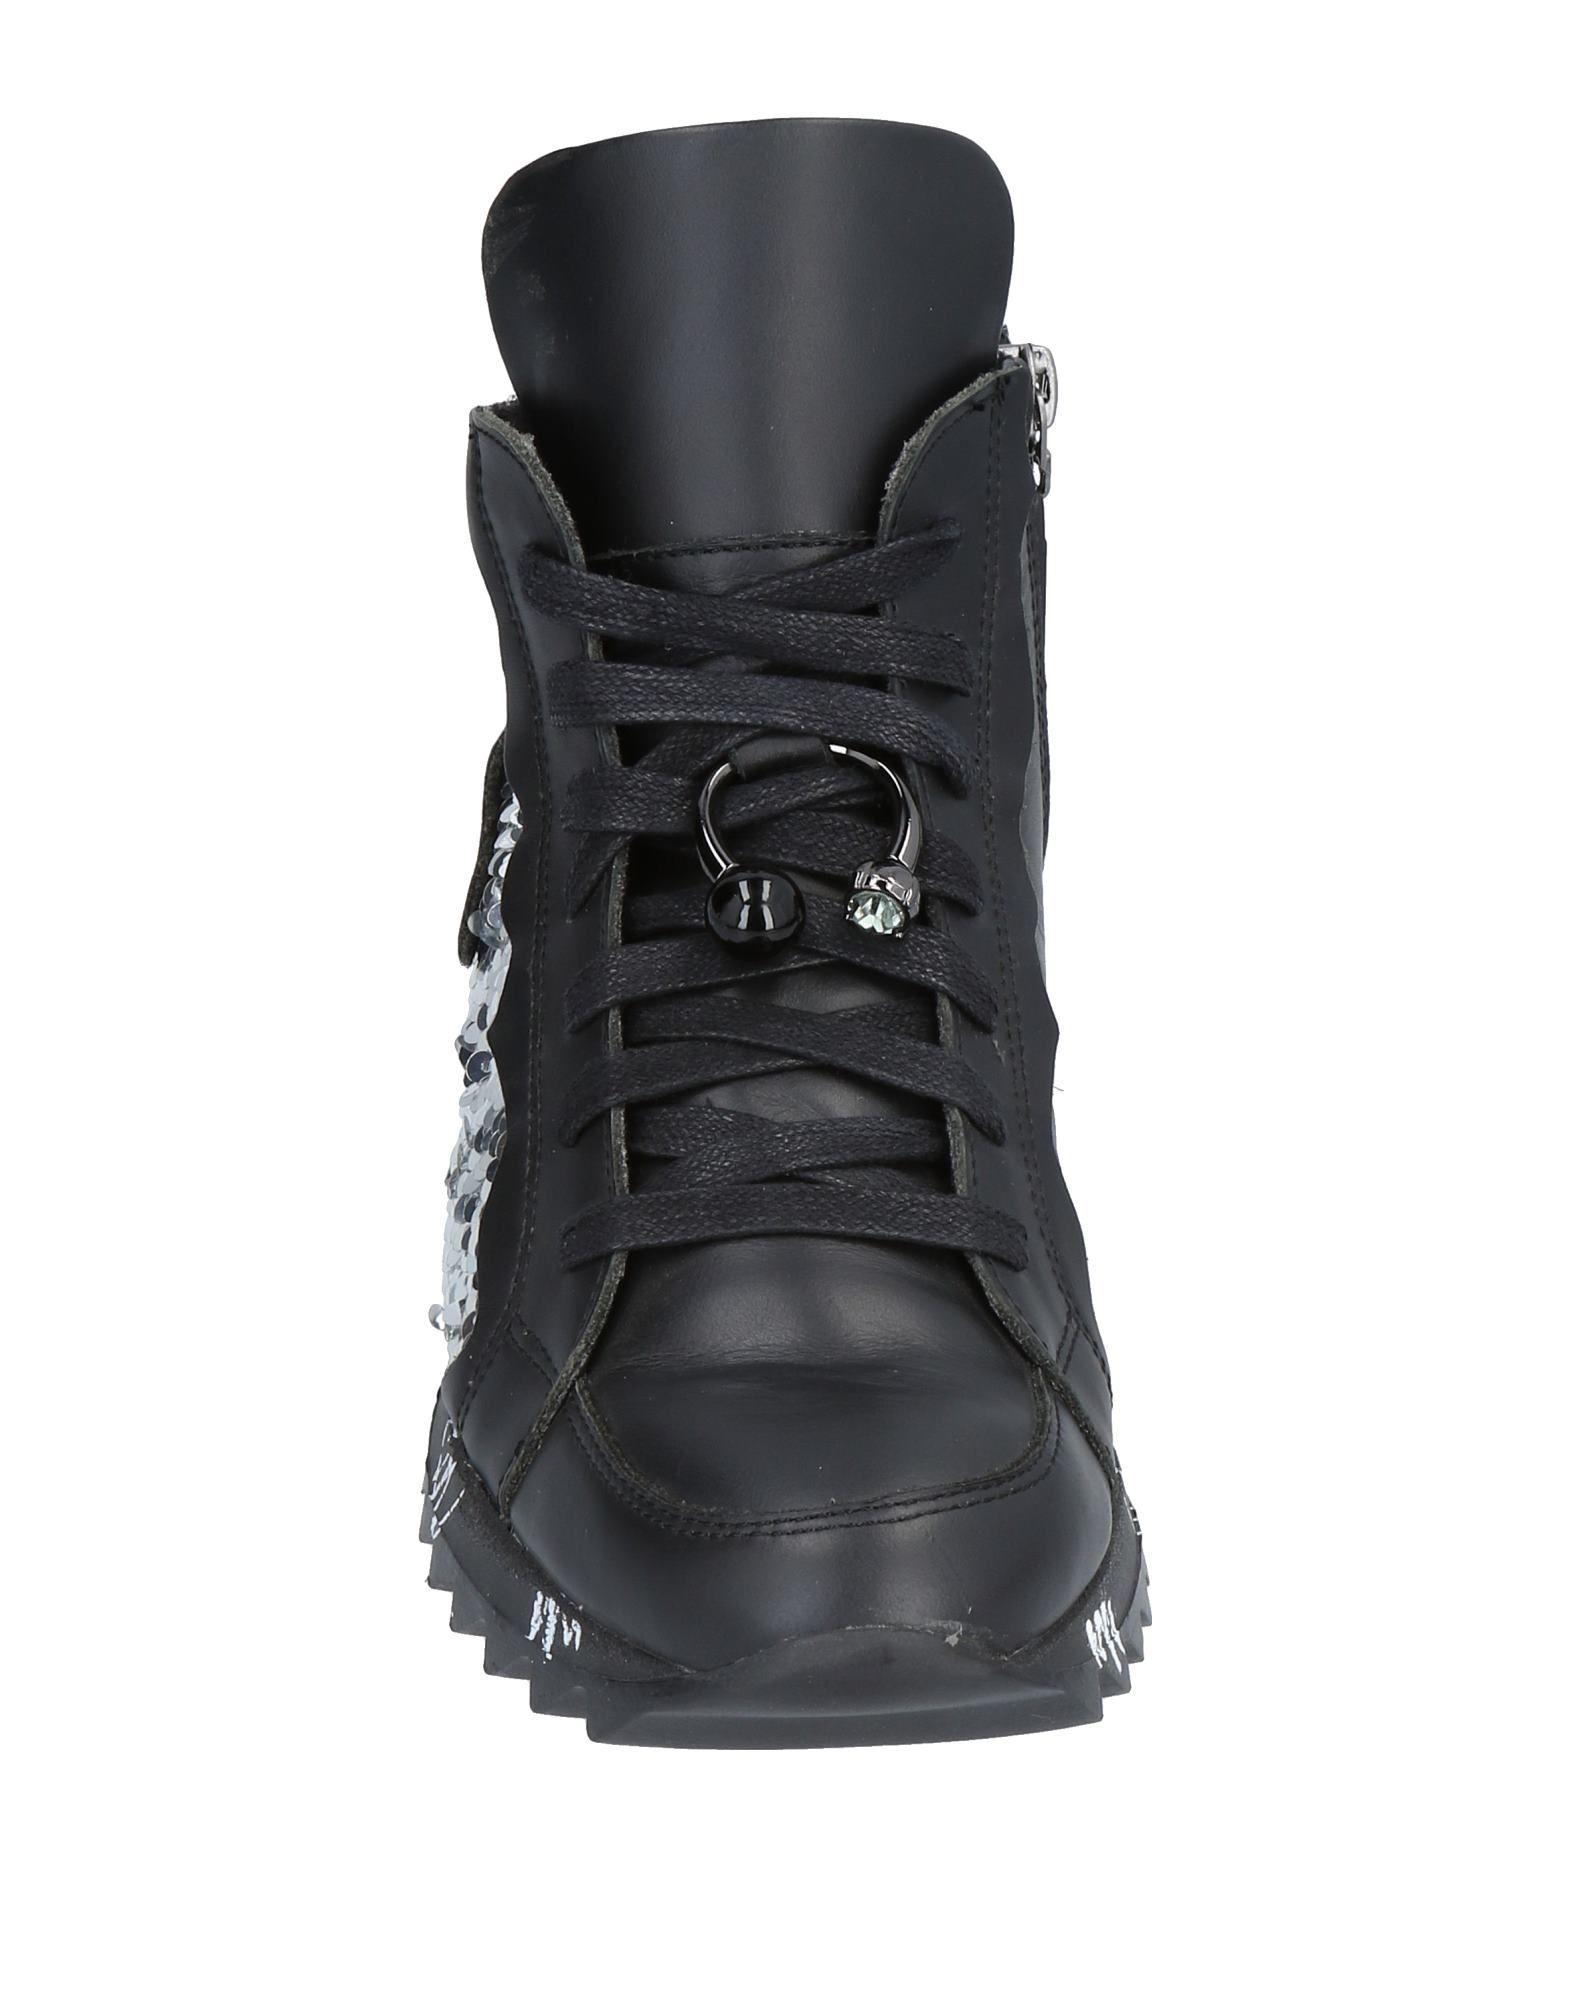 Alberto Venturini Gute Sneakers Damen  11481771FV Gute Venturini Qualität beliebte Schuhe ef74ec